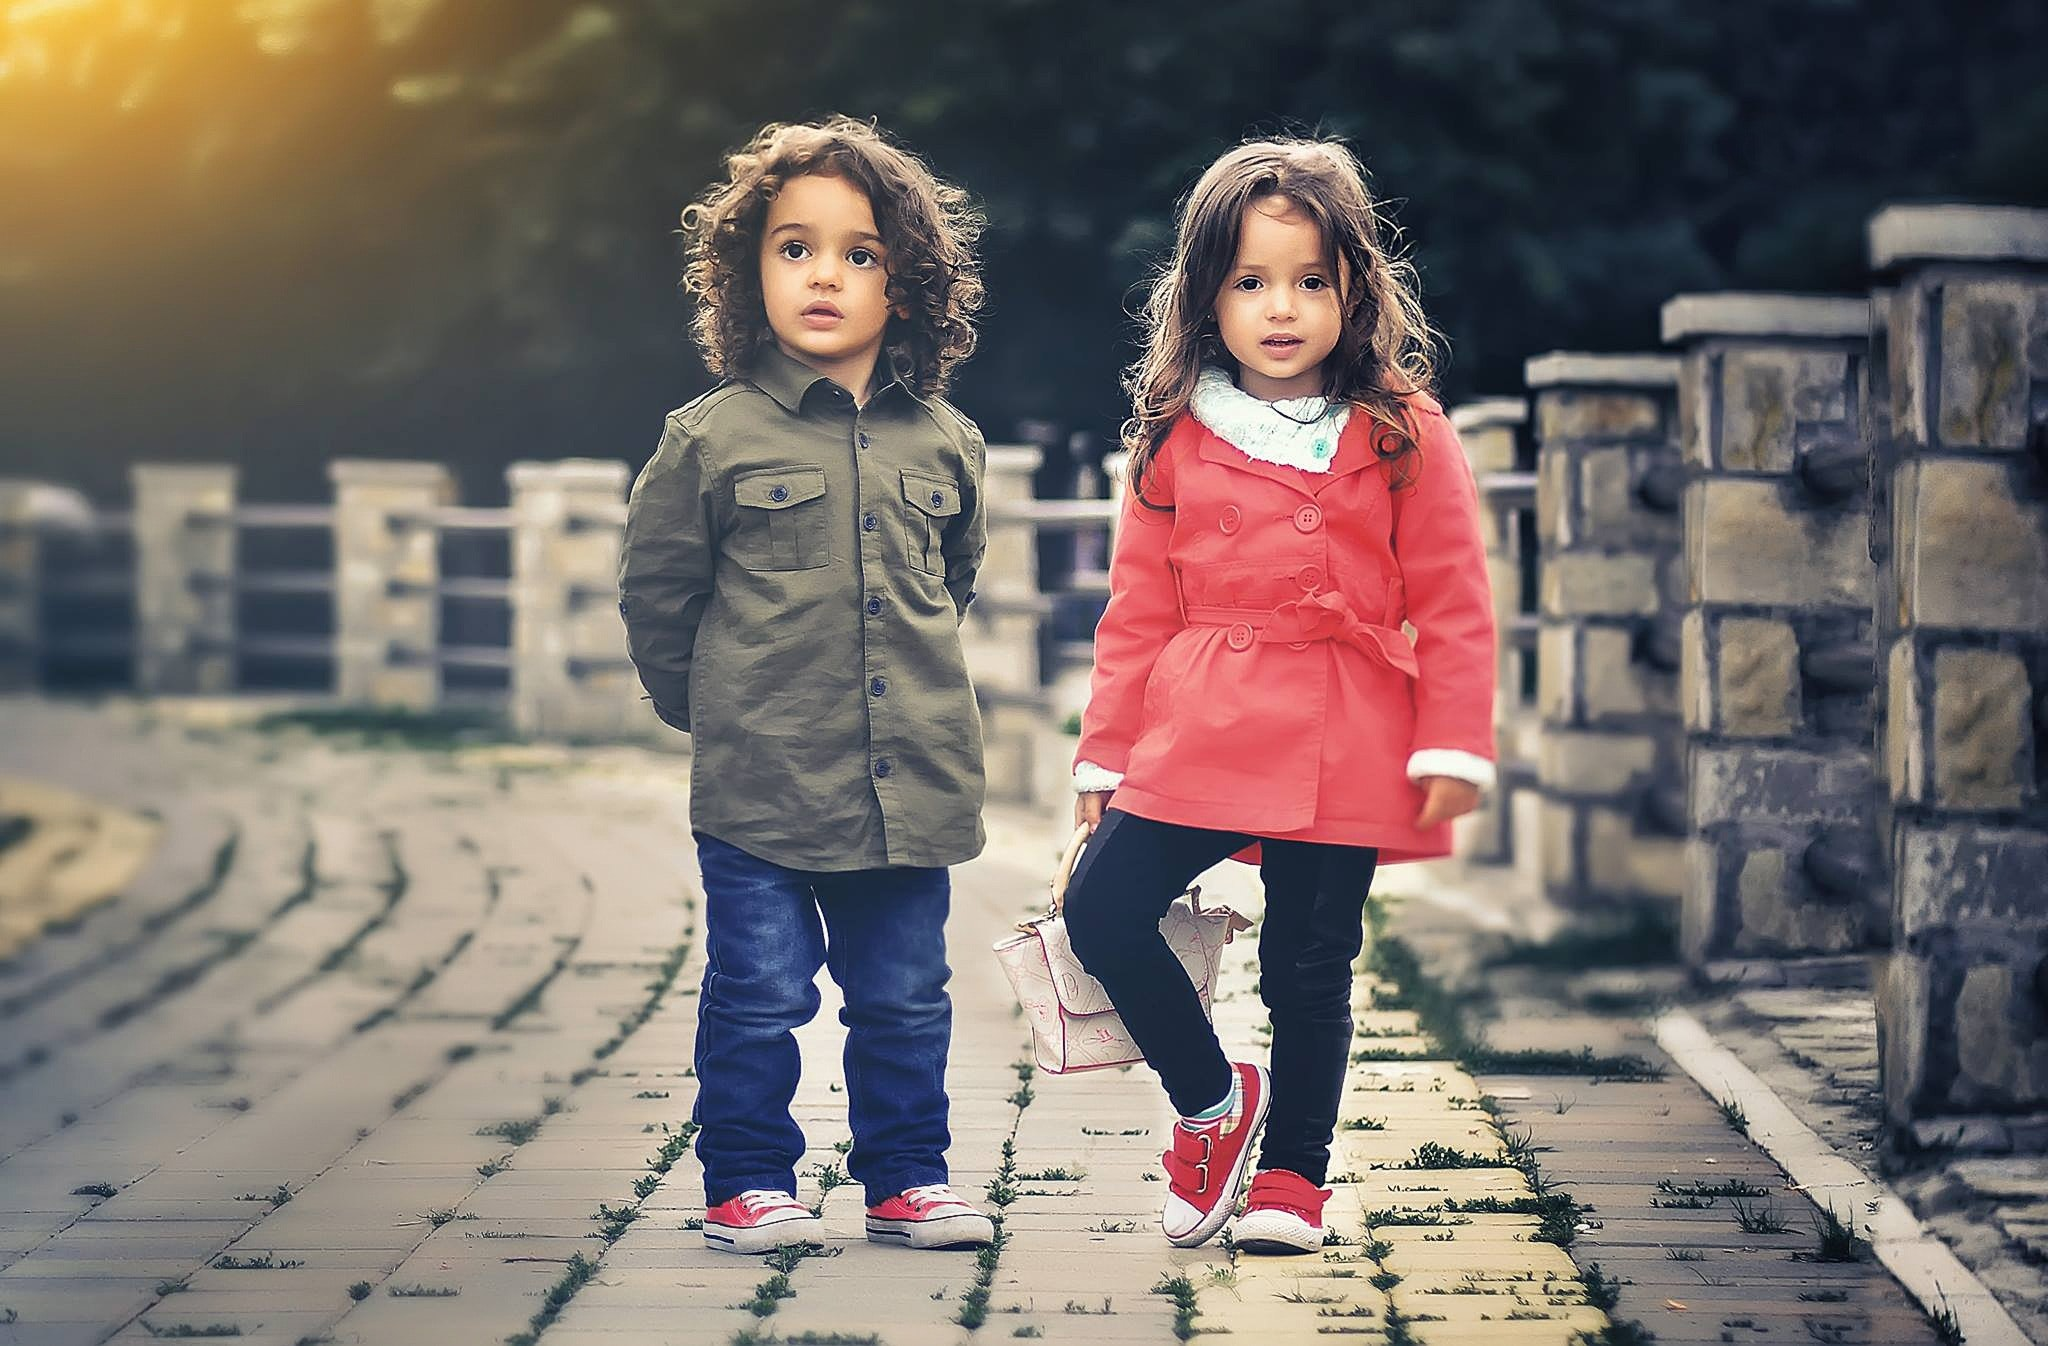 88f6298c6ef4 500+ Kid Photos · Pexels · Free Stock Photos